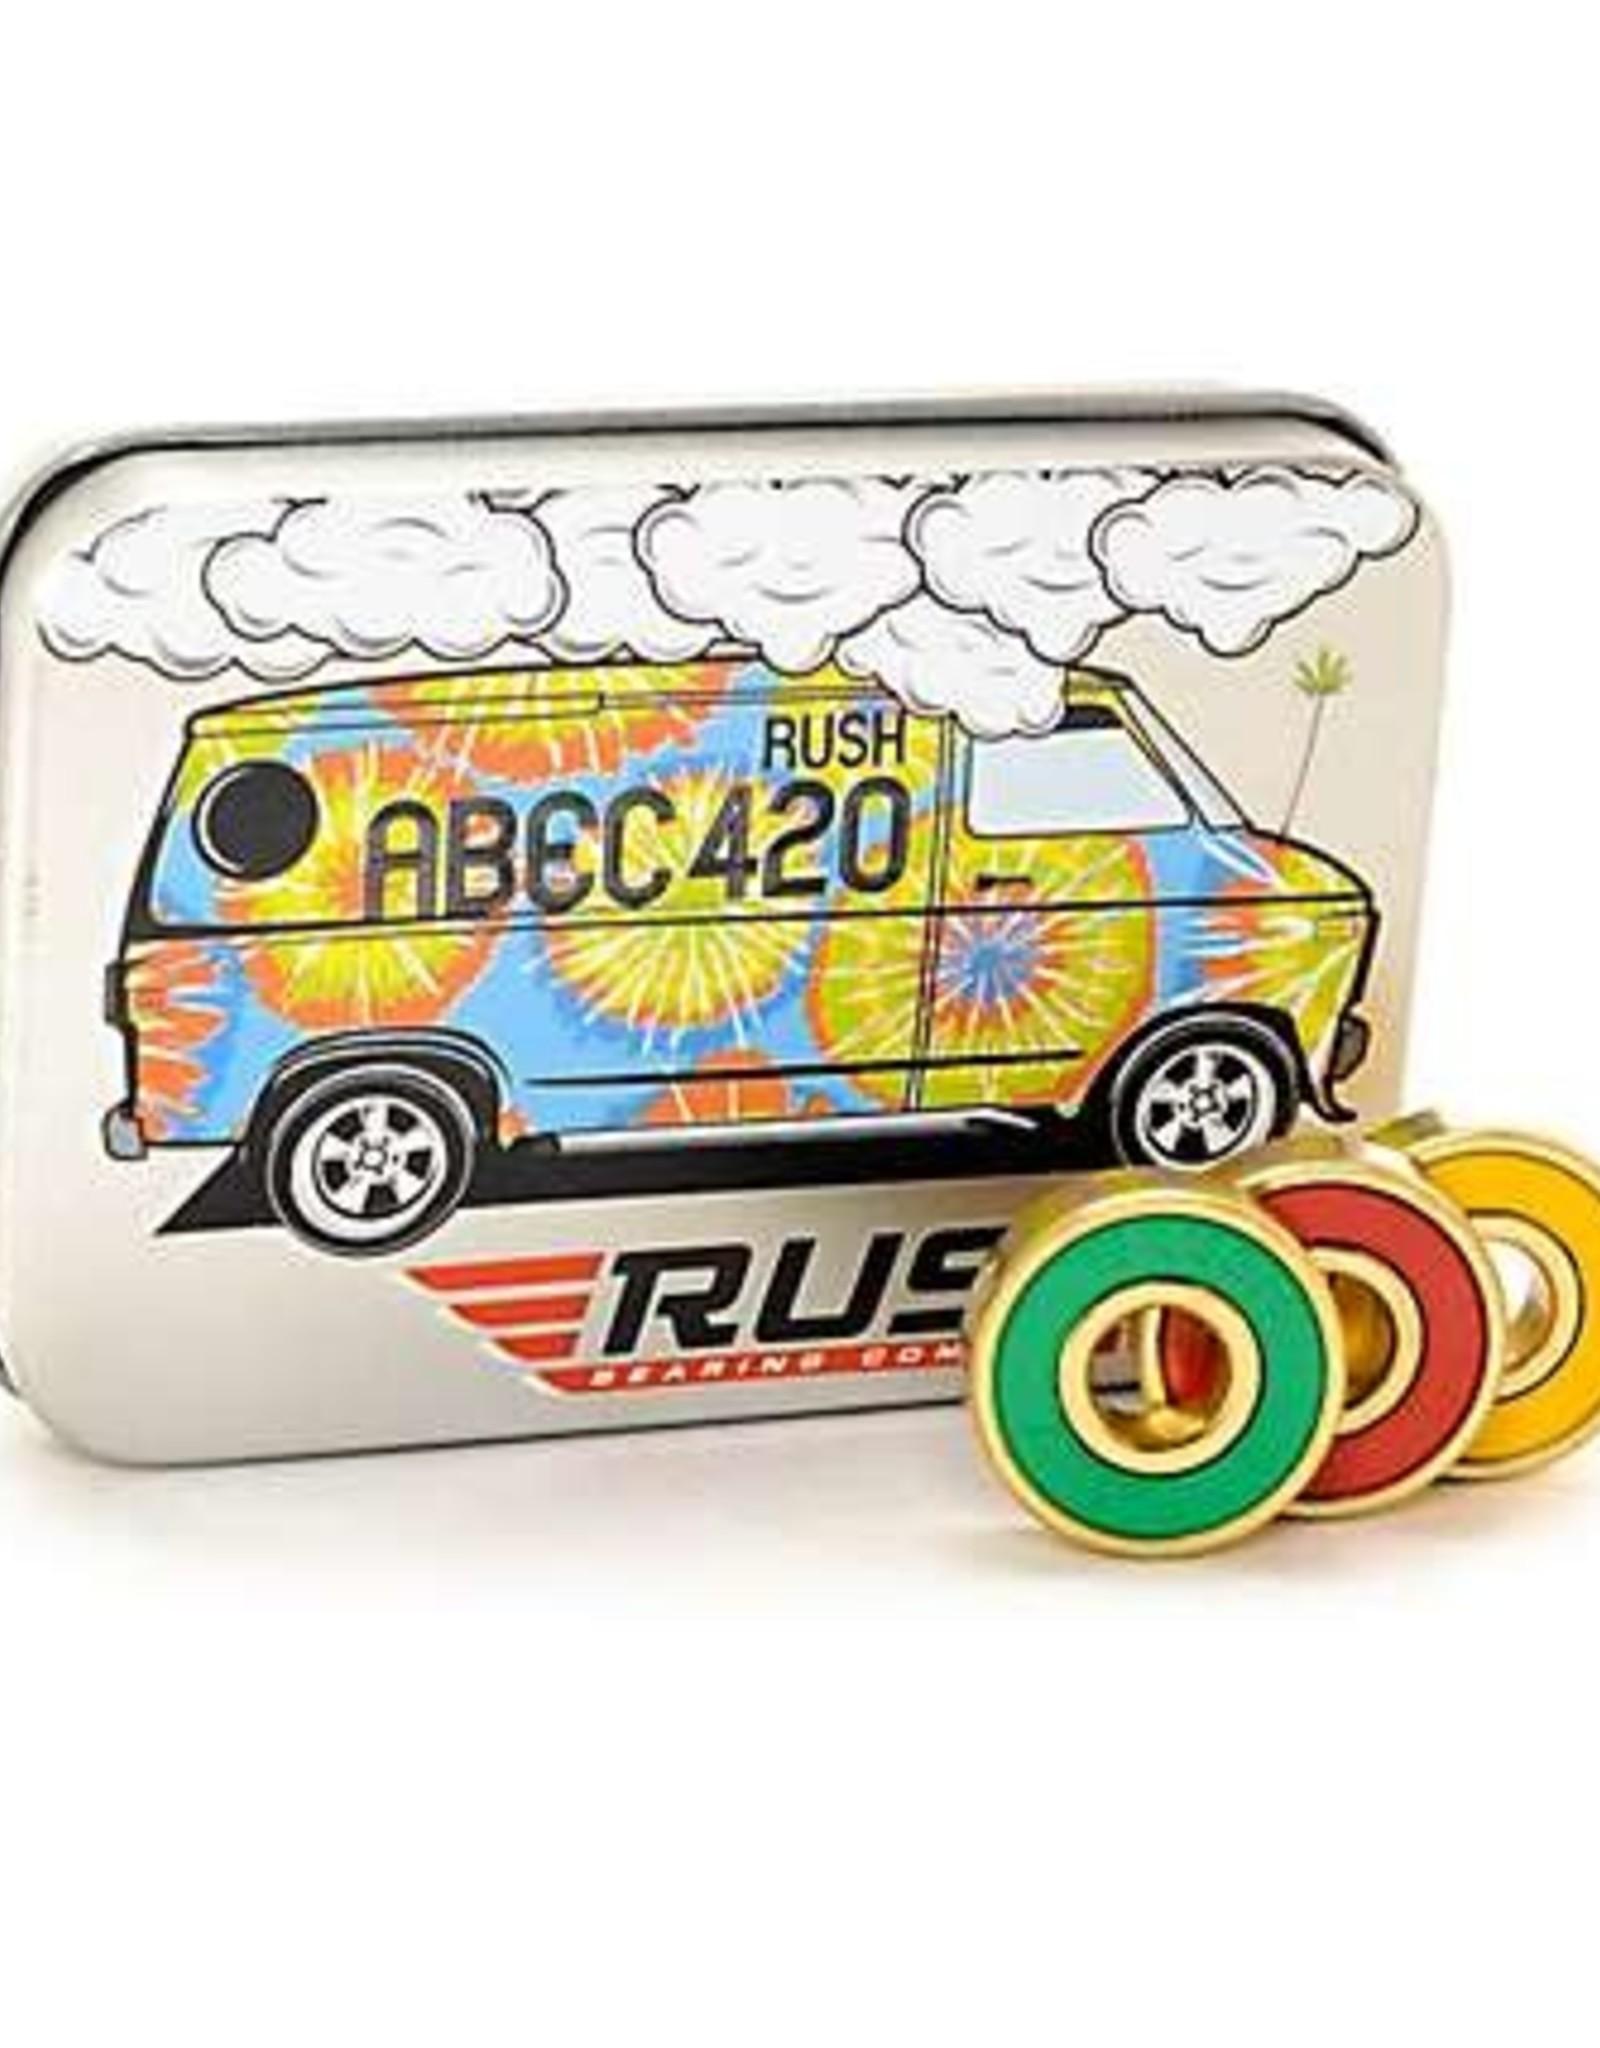 Rush - ABEC420 SK8 Bearings